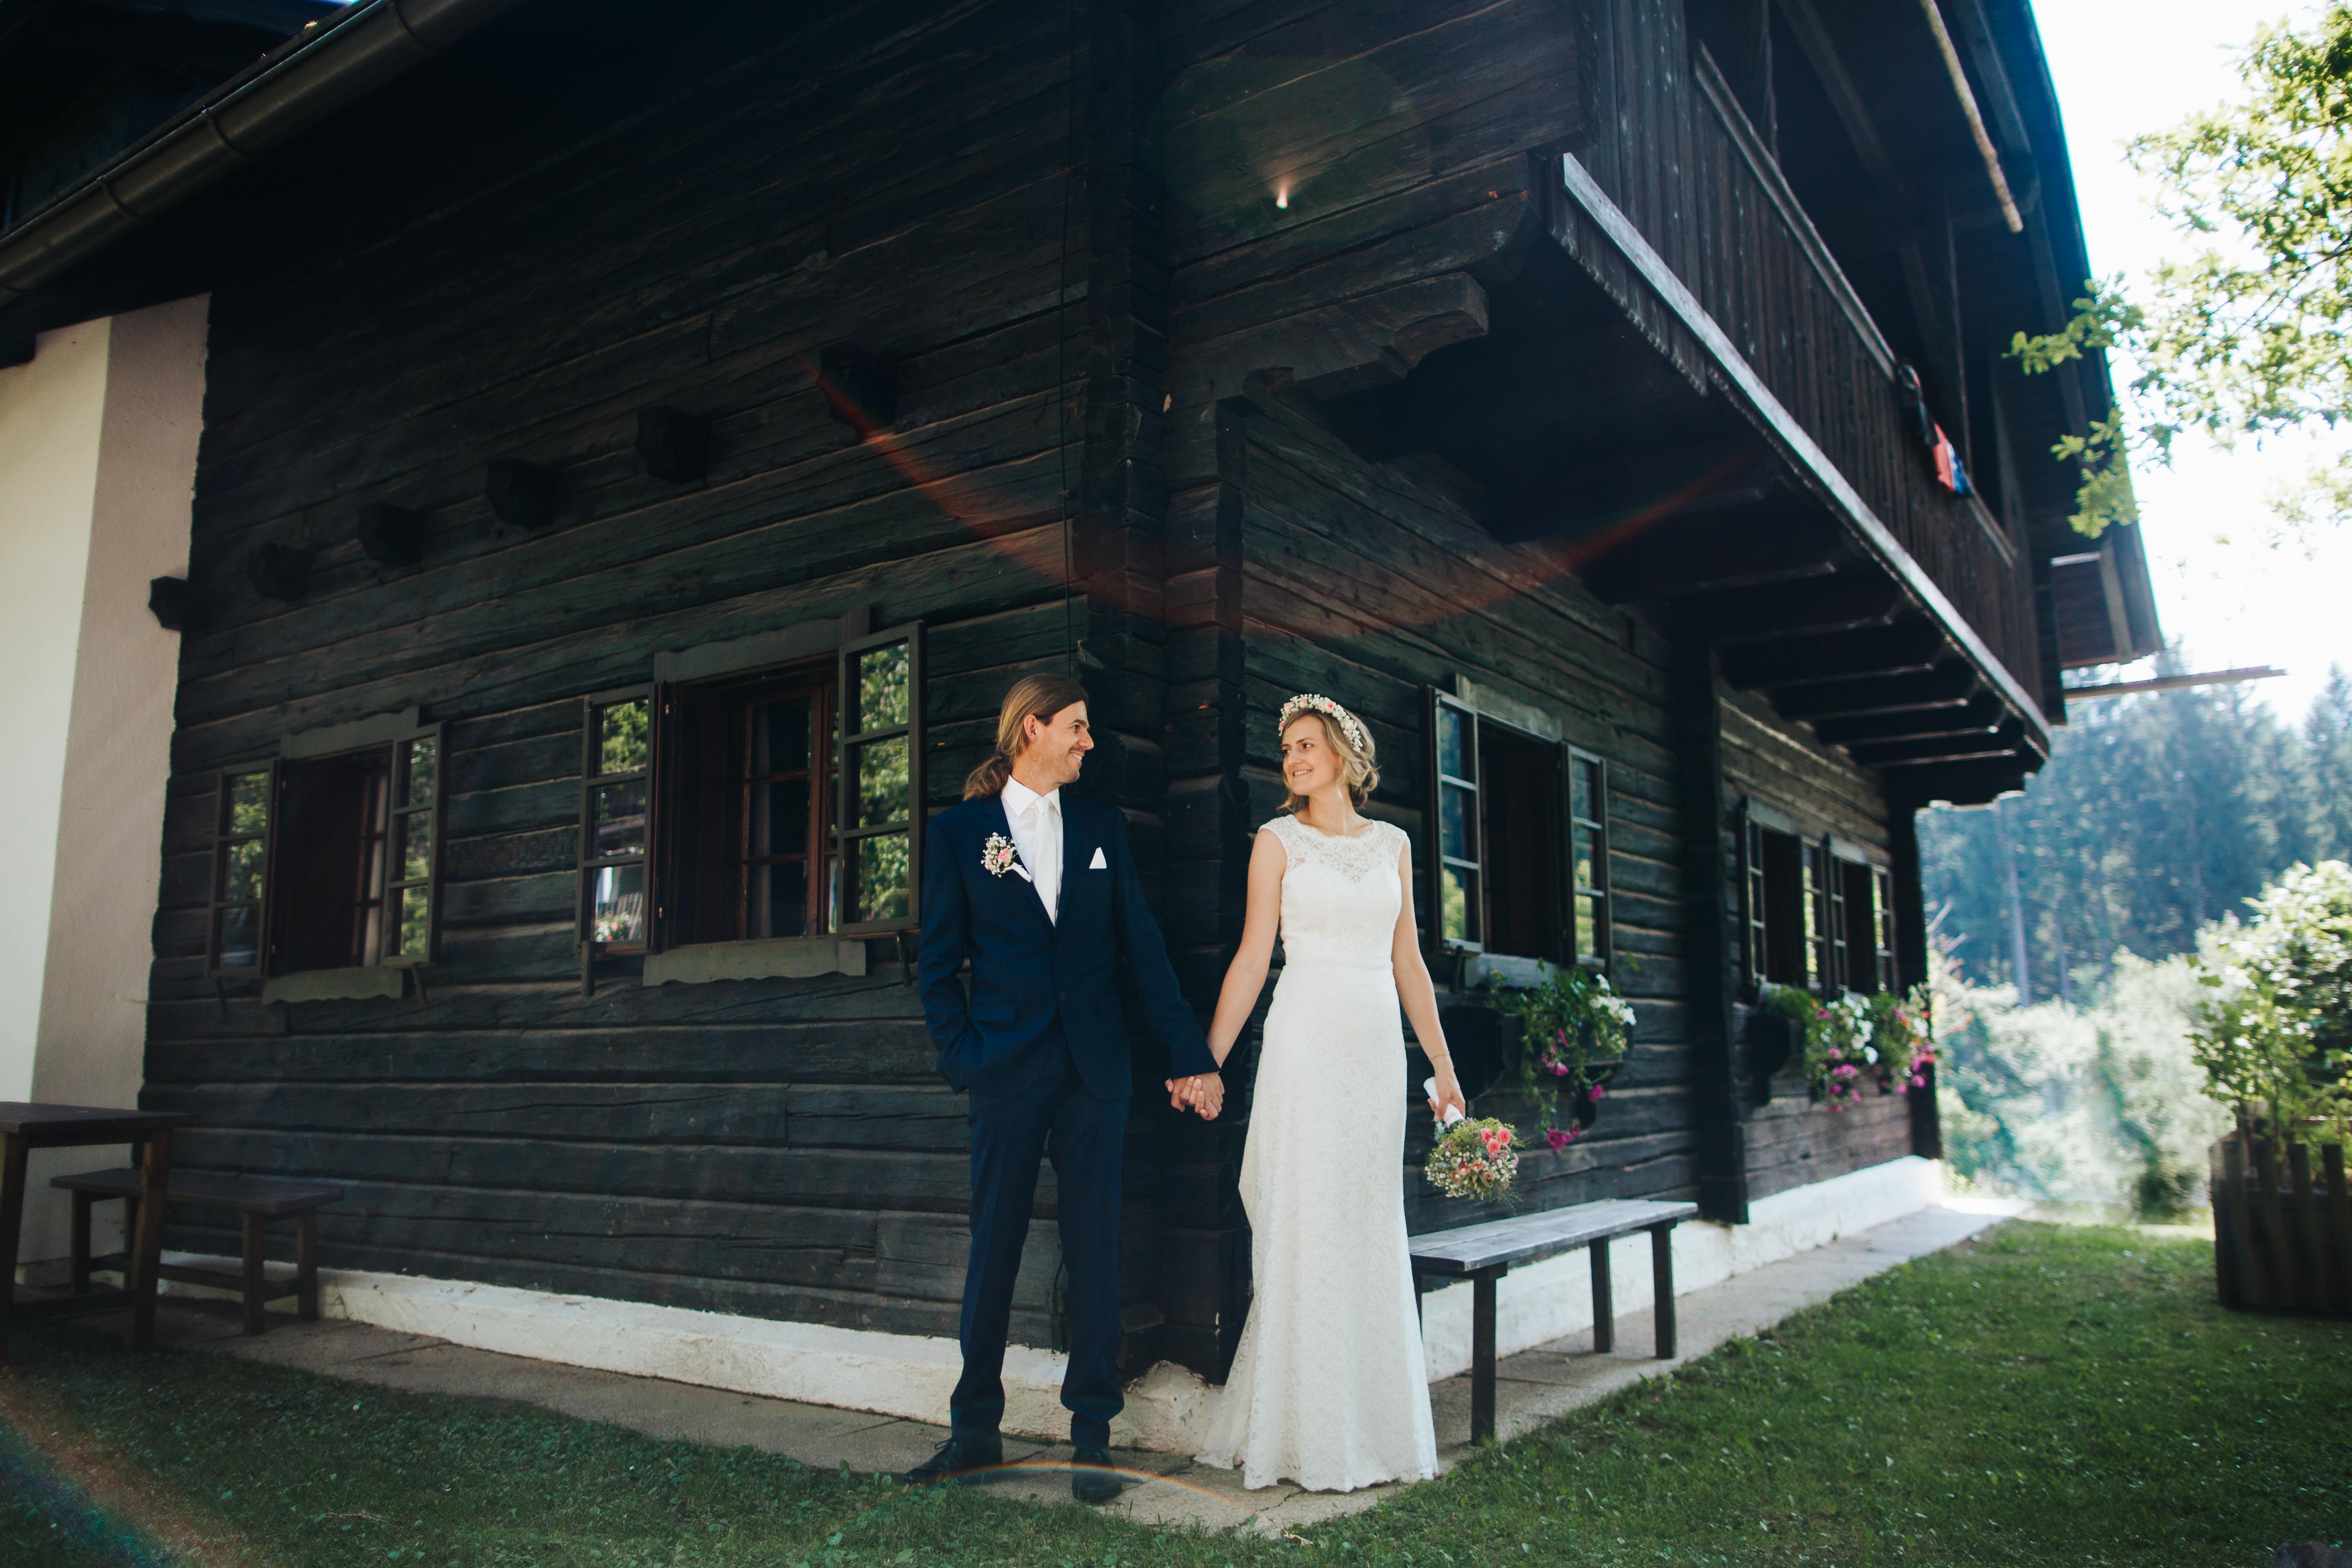 Simon & Evelyn Hochzeit-165